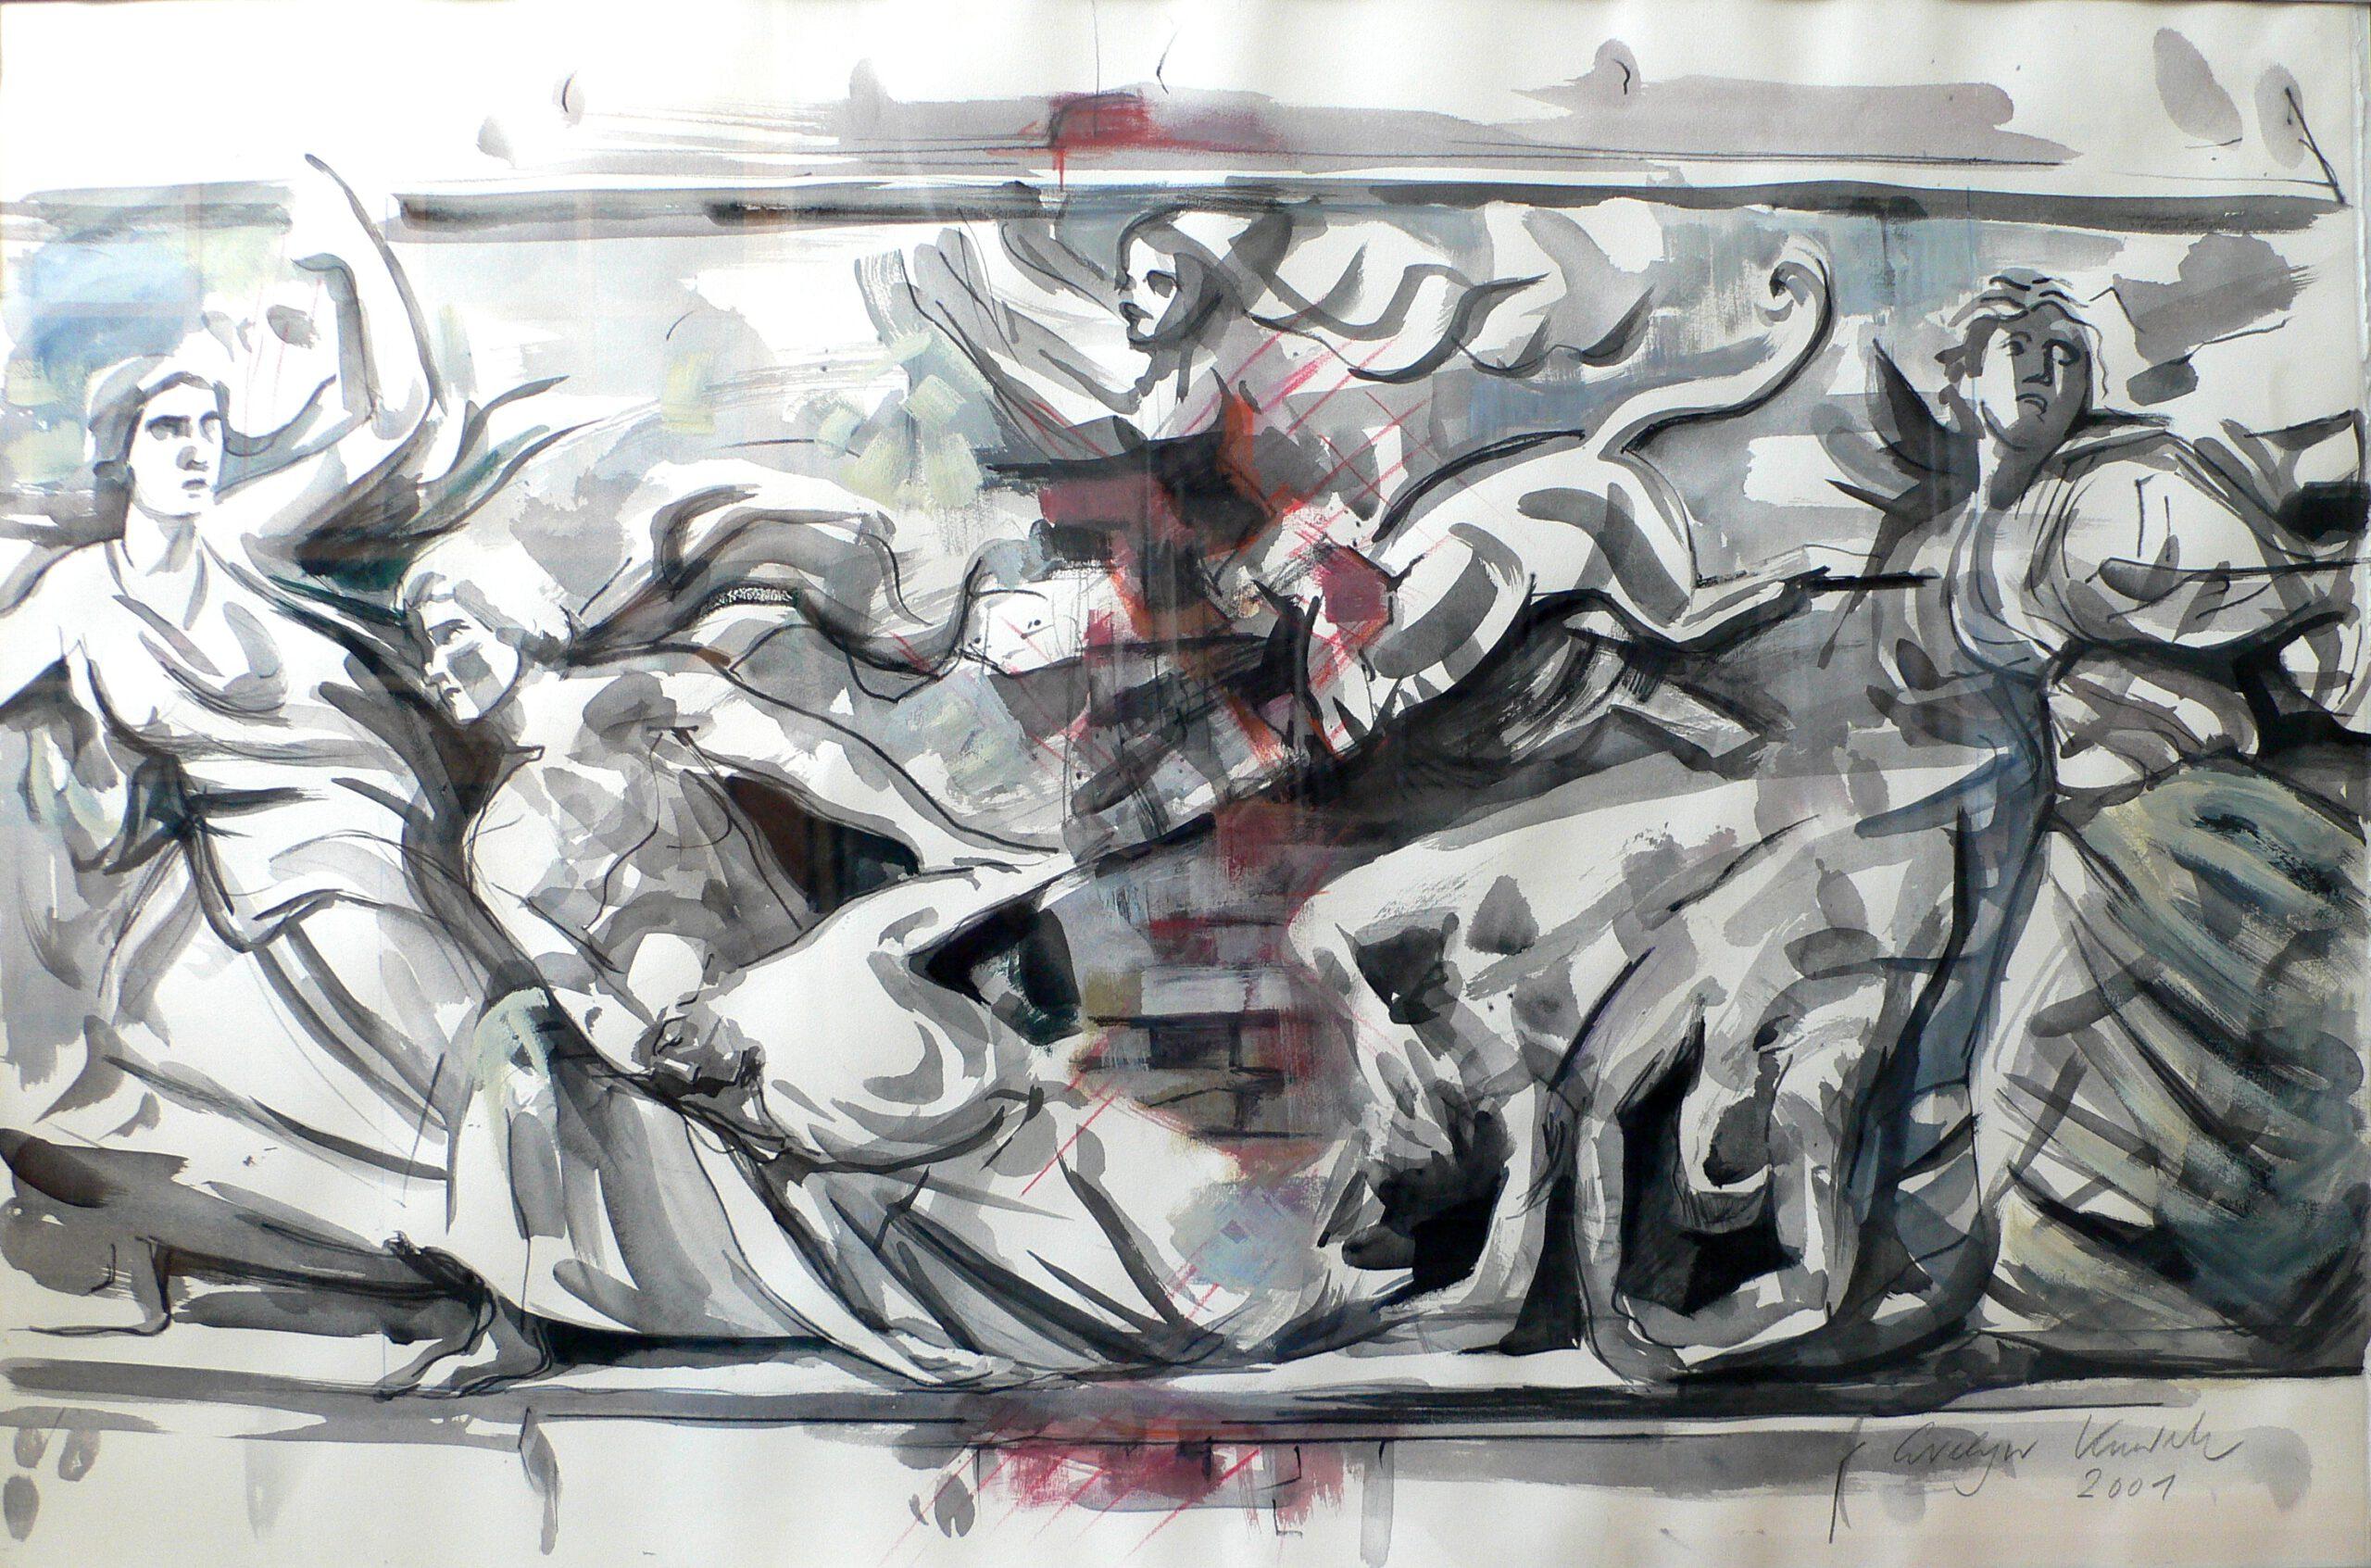 Neues Museum 1999 | 180 / 90cm, Tempera, Öl / Leinwand